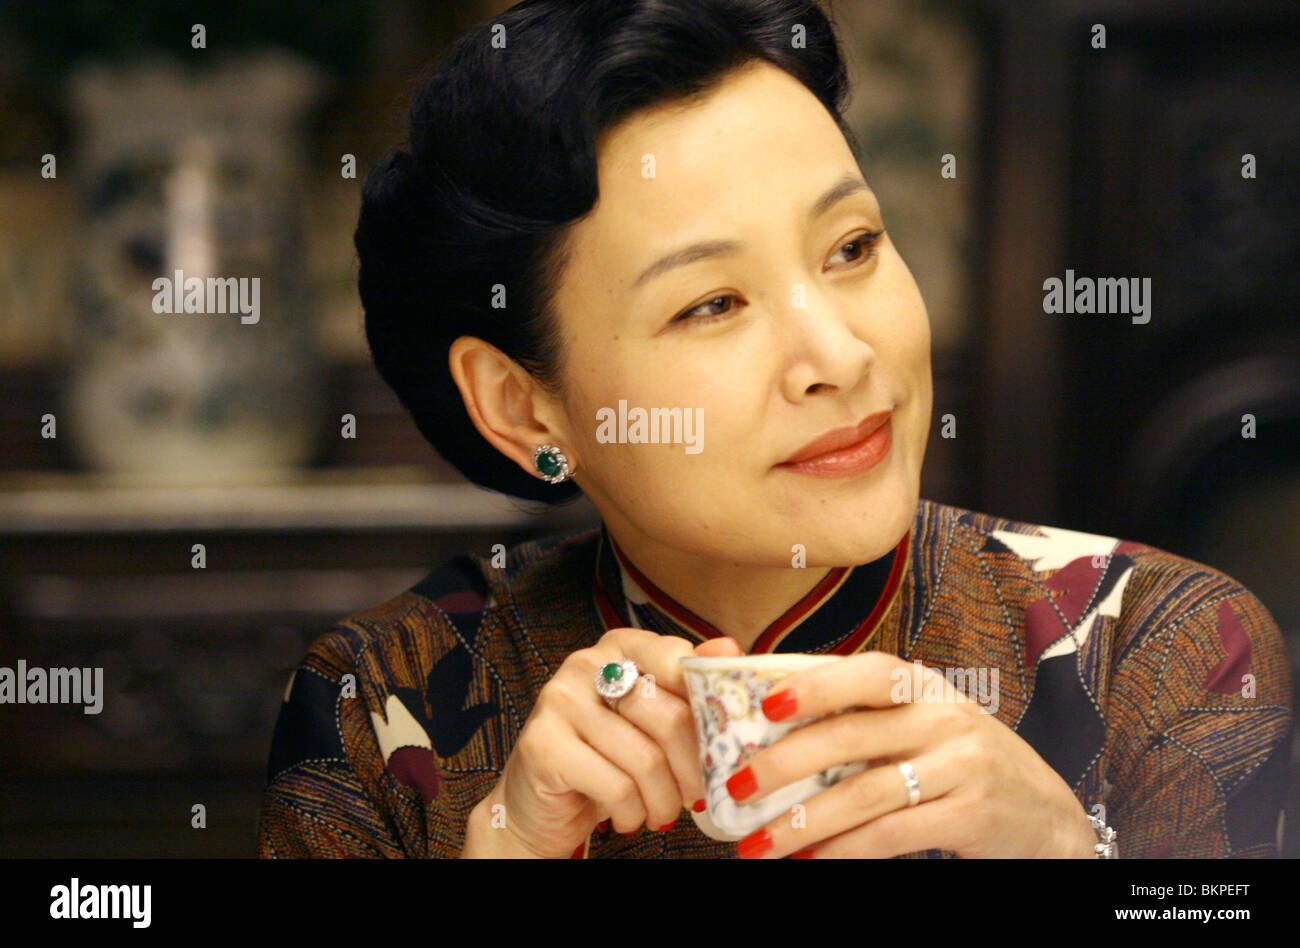 SE, JIE (2007) LUST (ALT) JOAN CHEN ANG LEE (DIR) SEJI 015 - Stock Image